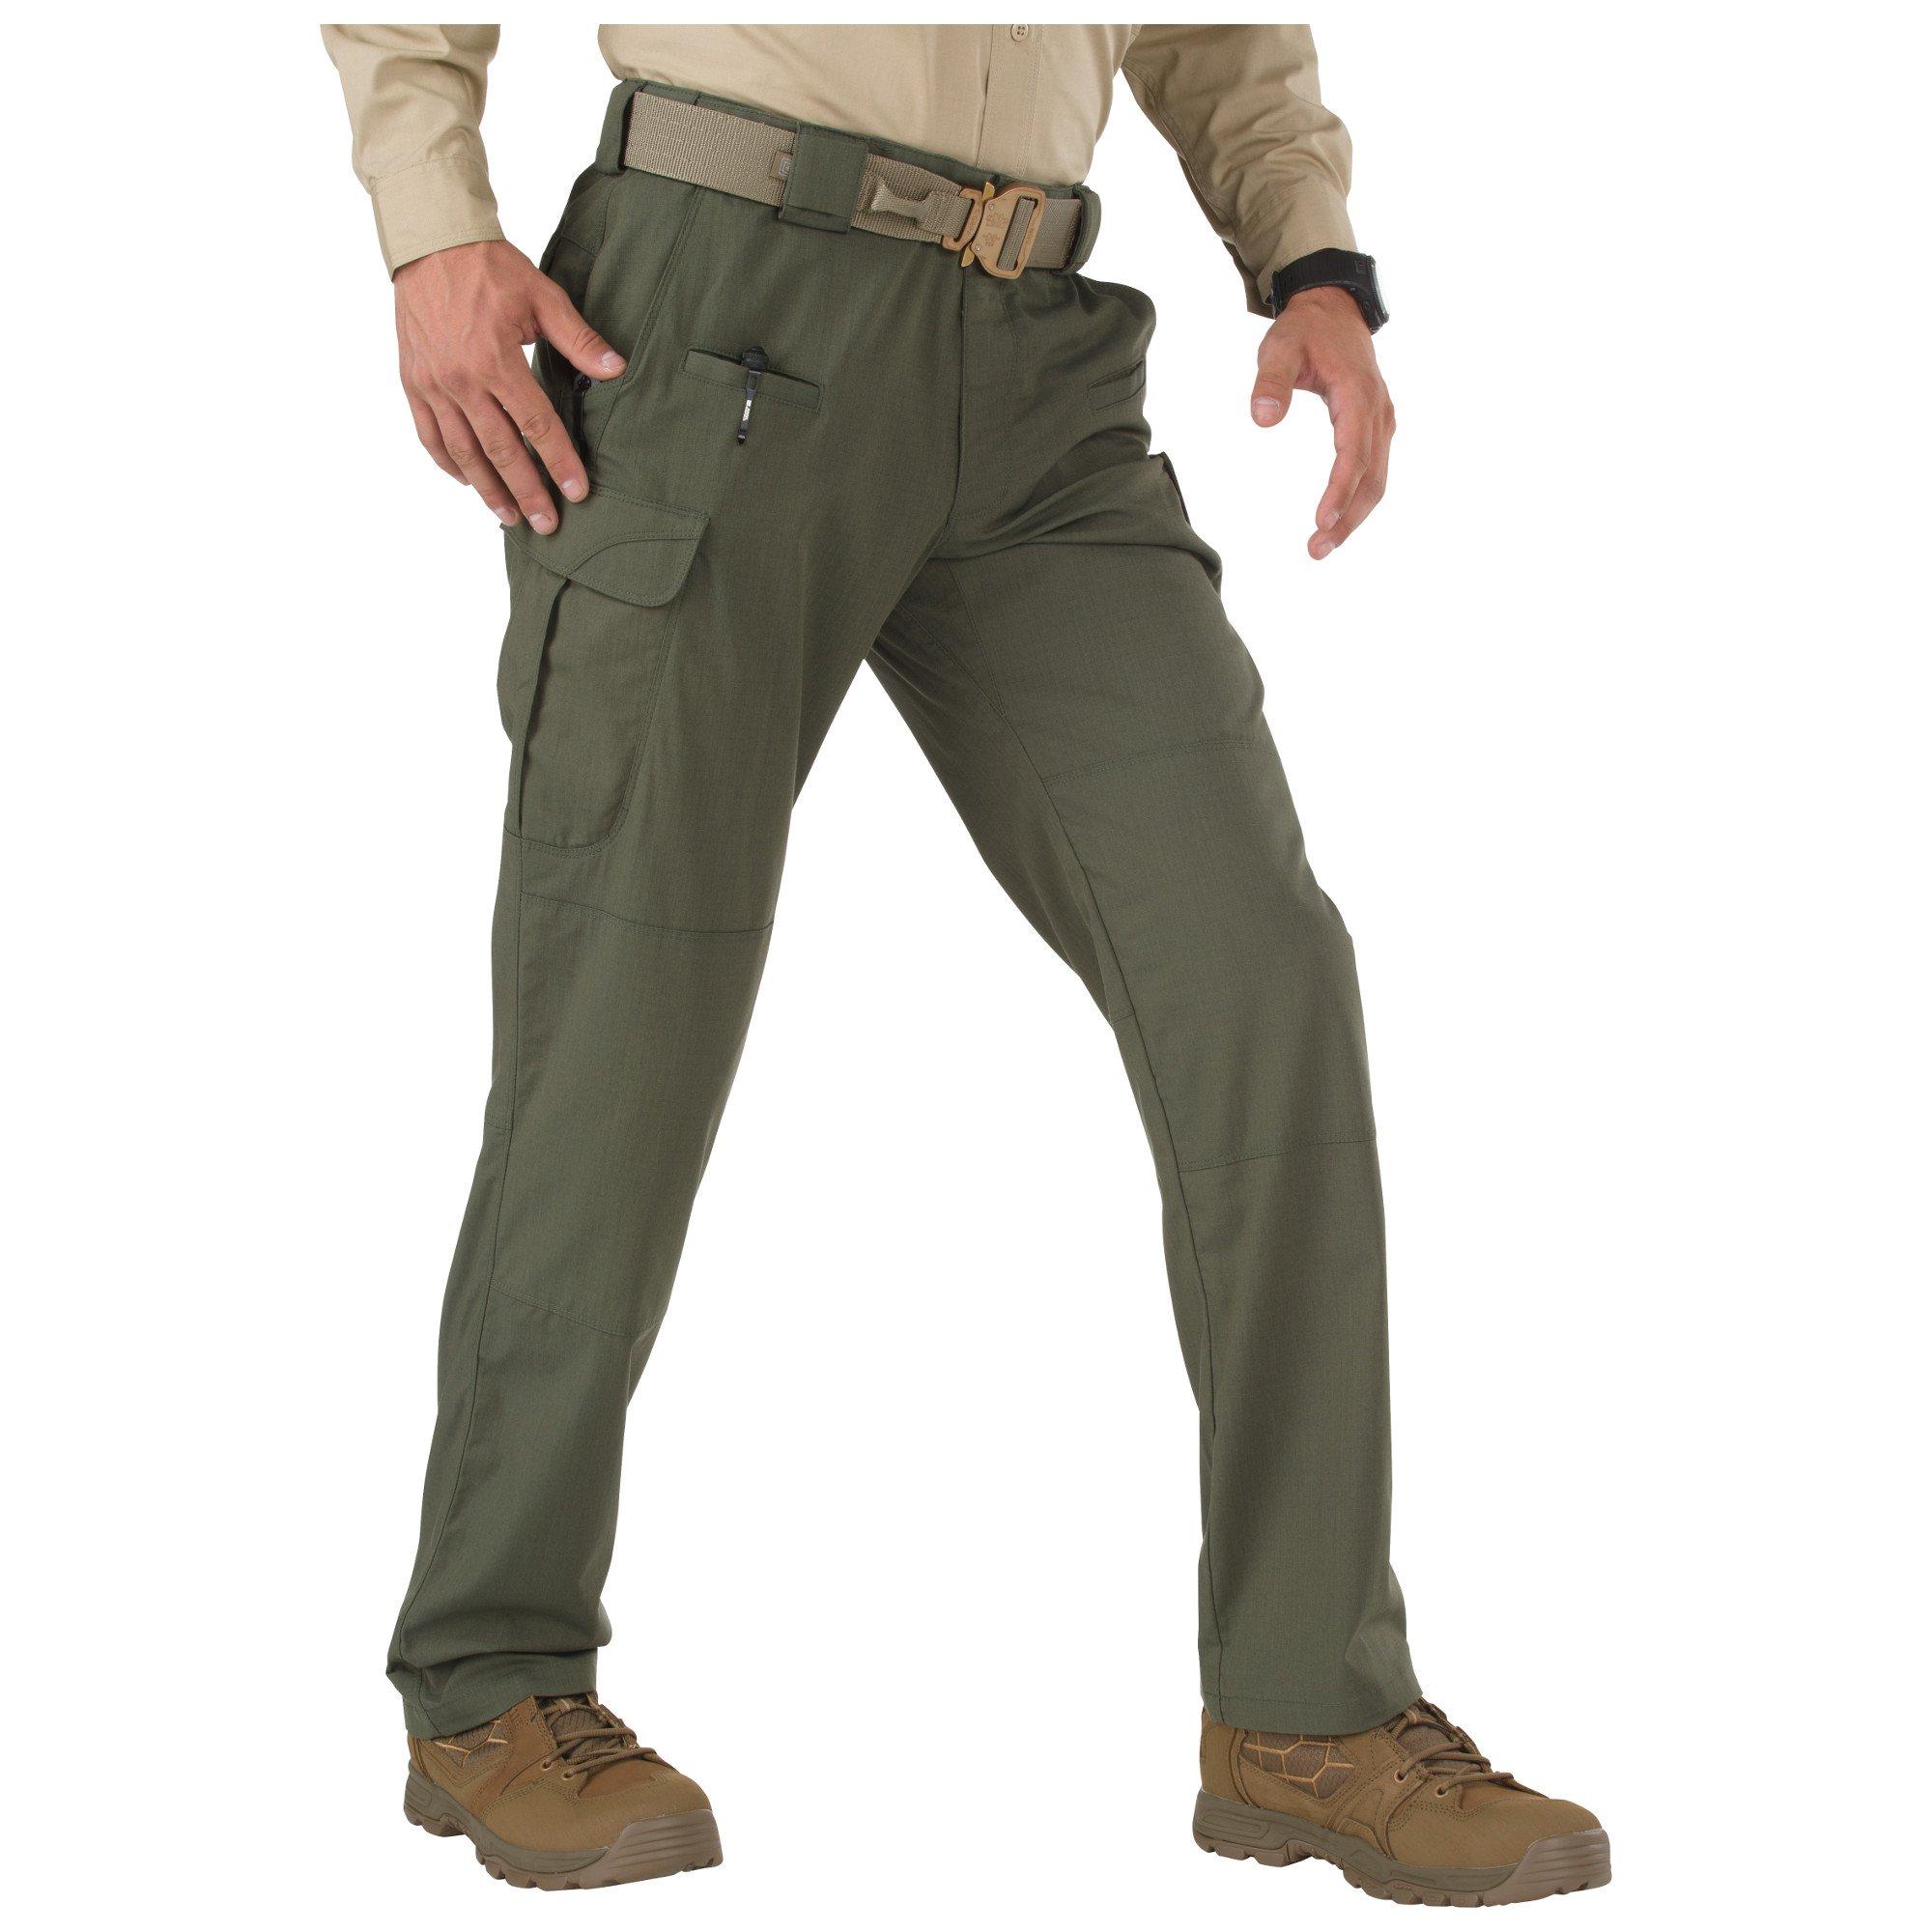 5.11 Stryke Pant – TDU Green